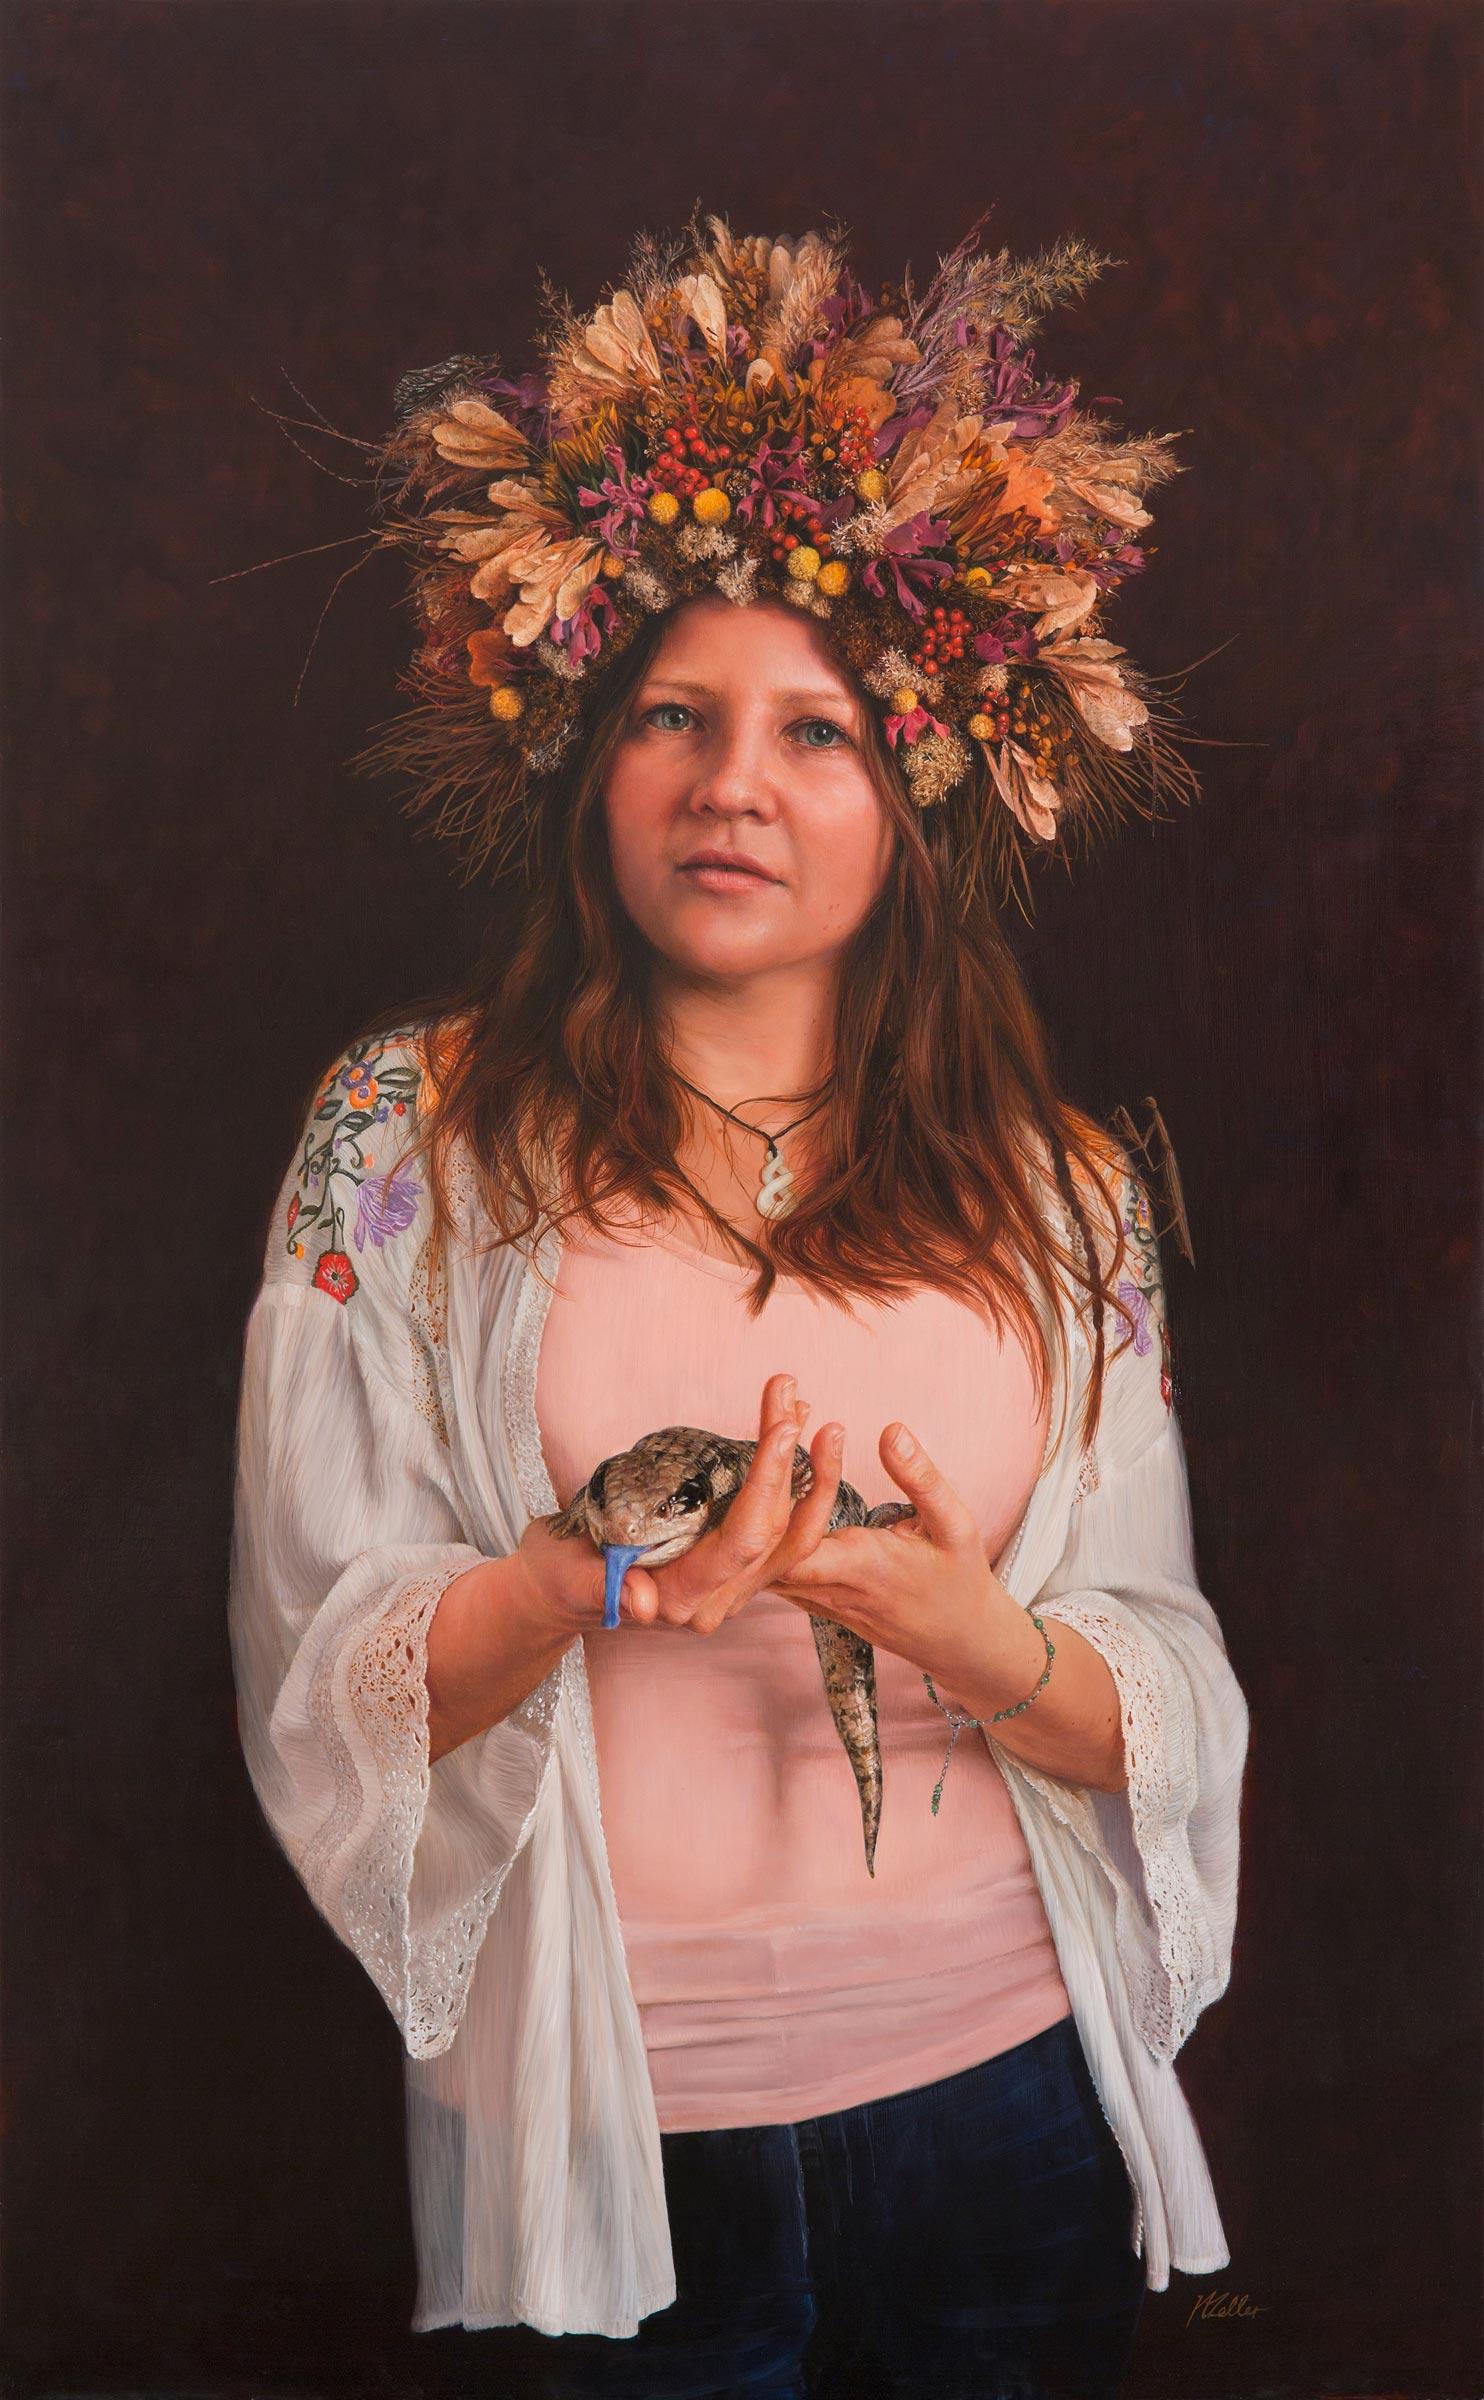 Finalist - Carma - Darling Portrait Prize